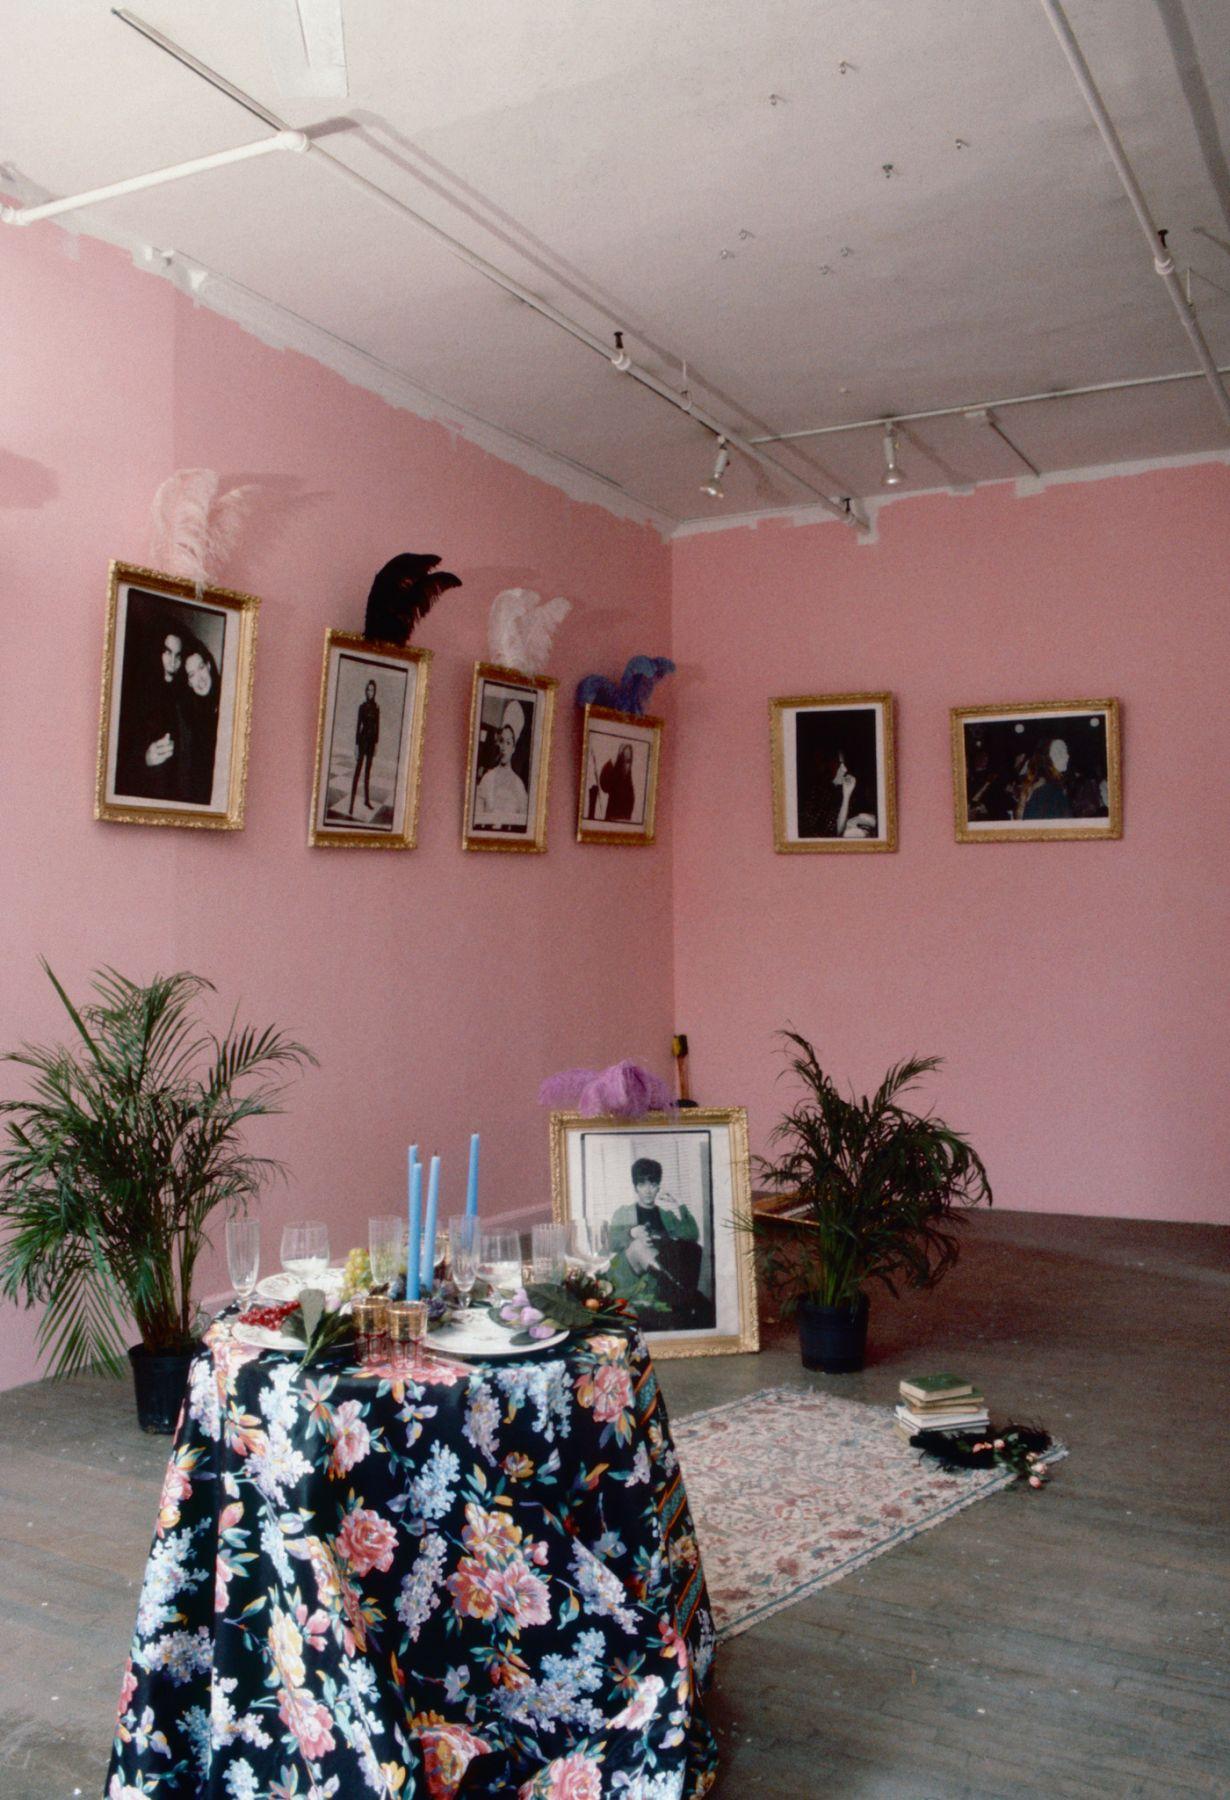 Karen Kilimnik, The Adventure Club, 1993, Installation view: 303 Gallery, New York